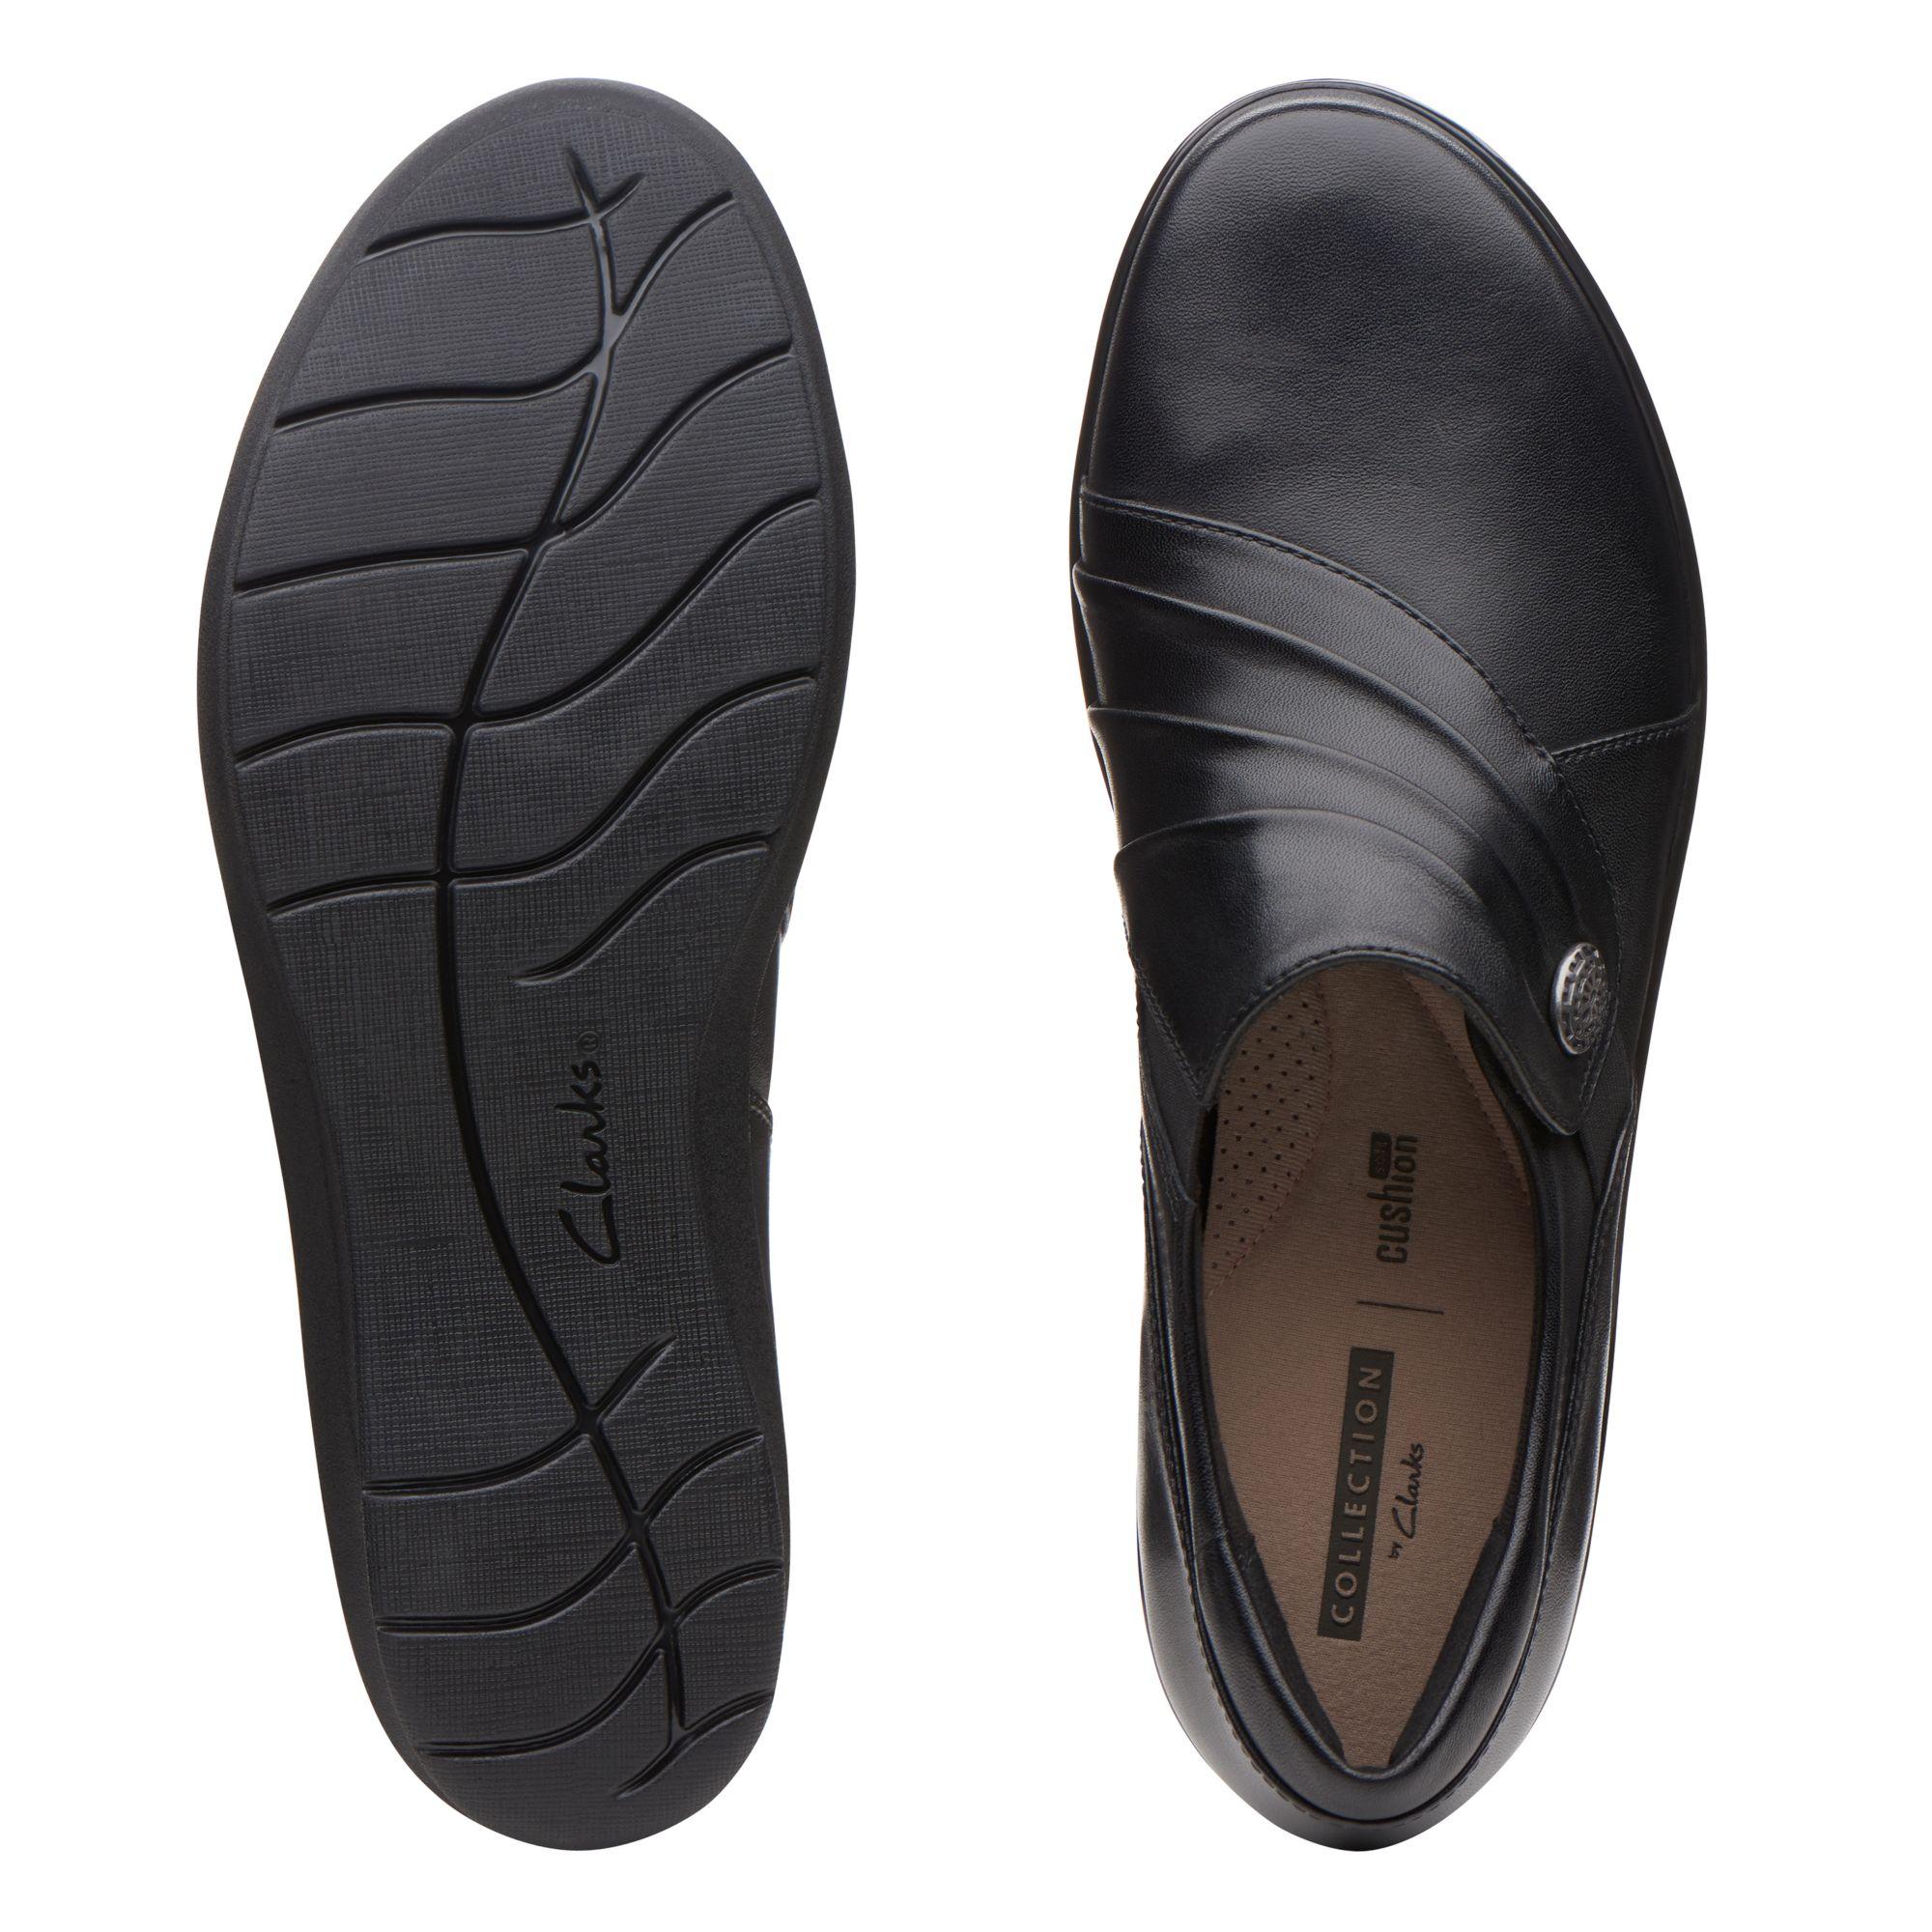 Black Flat Shoes - Hope Roxanne   Clarks